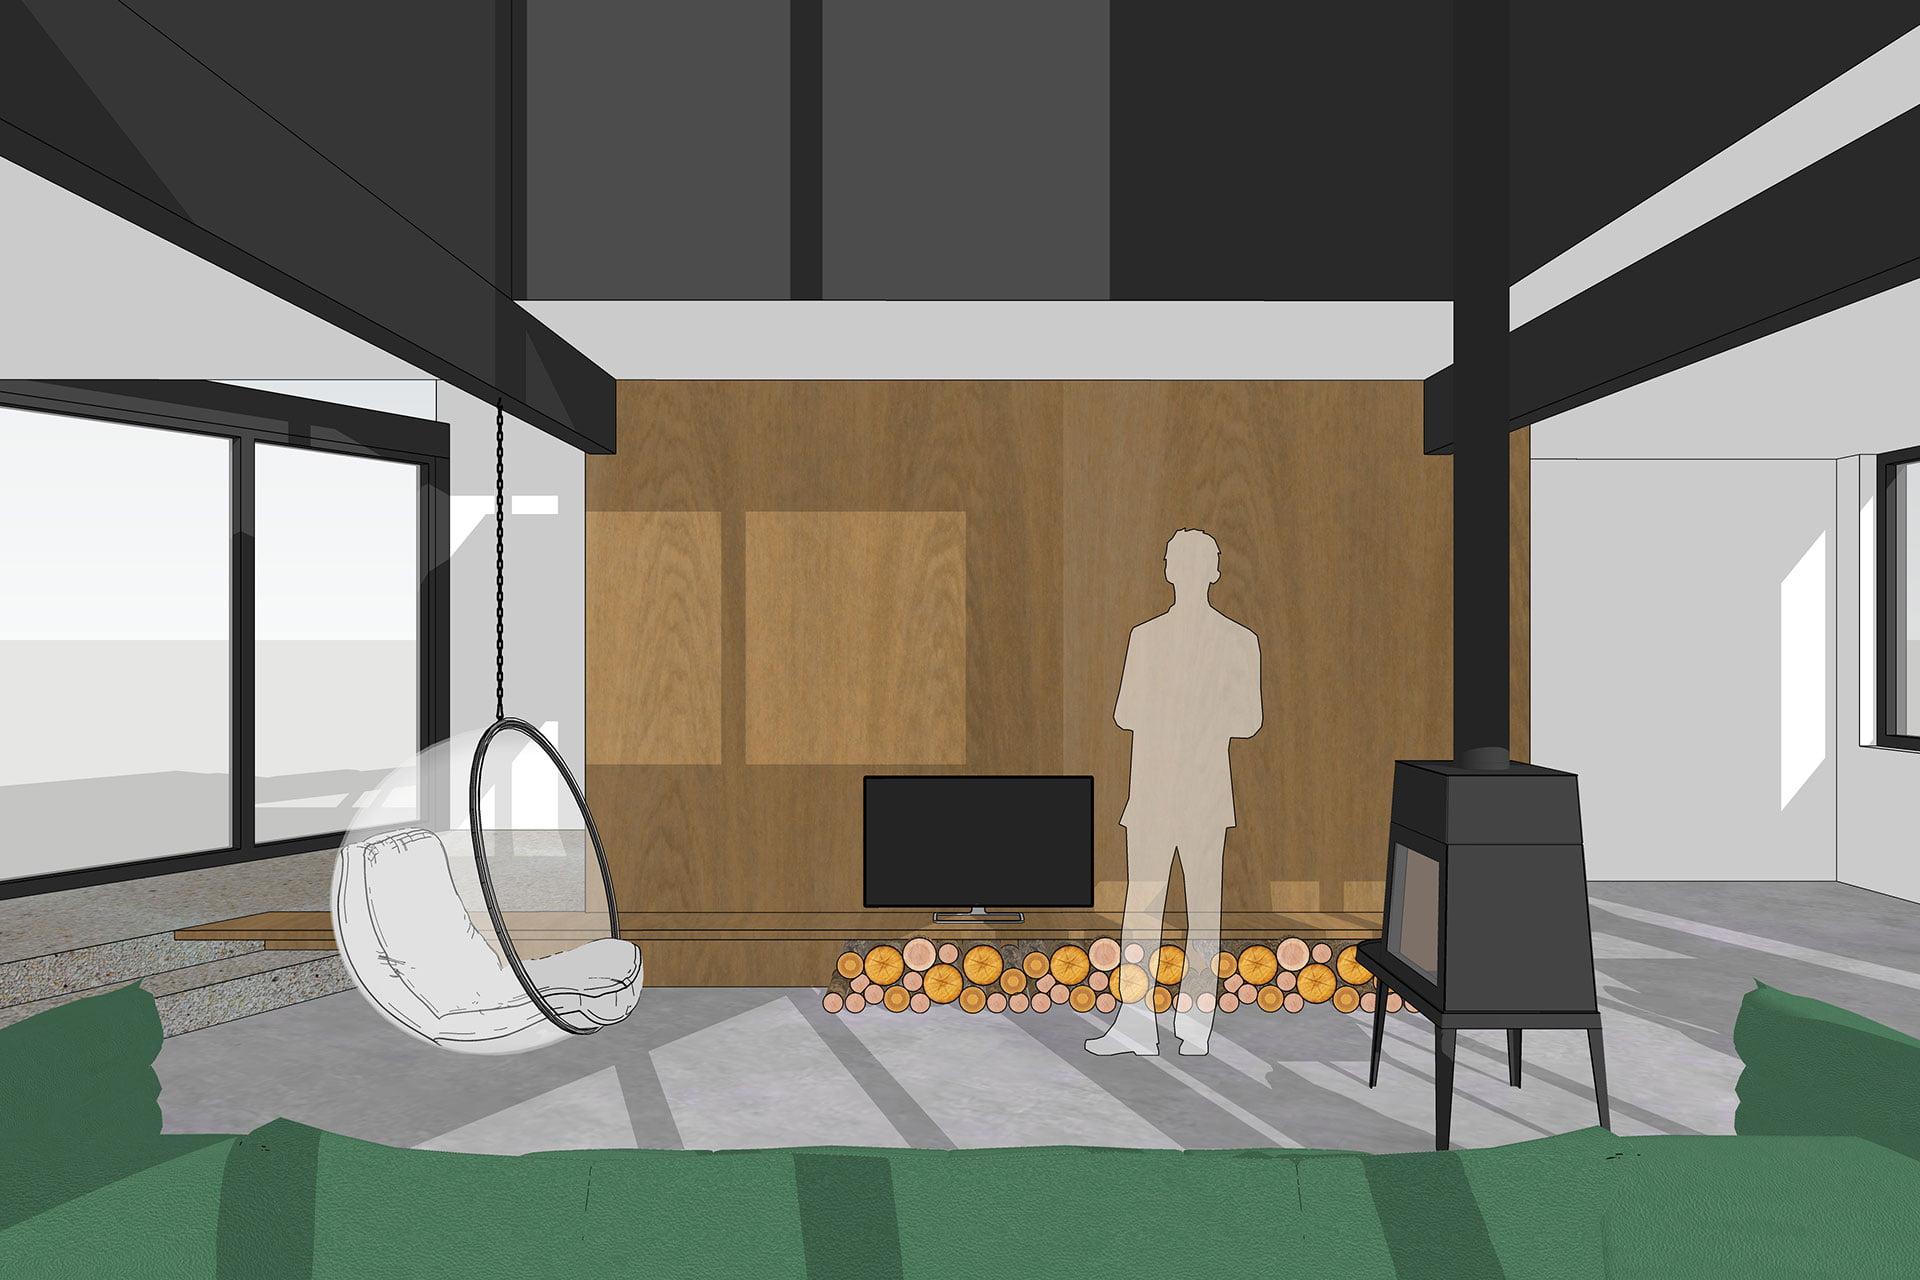 8A Architecten - interne verbouwing en interieur tussenwoning Barendrecht